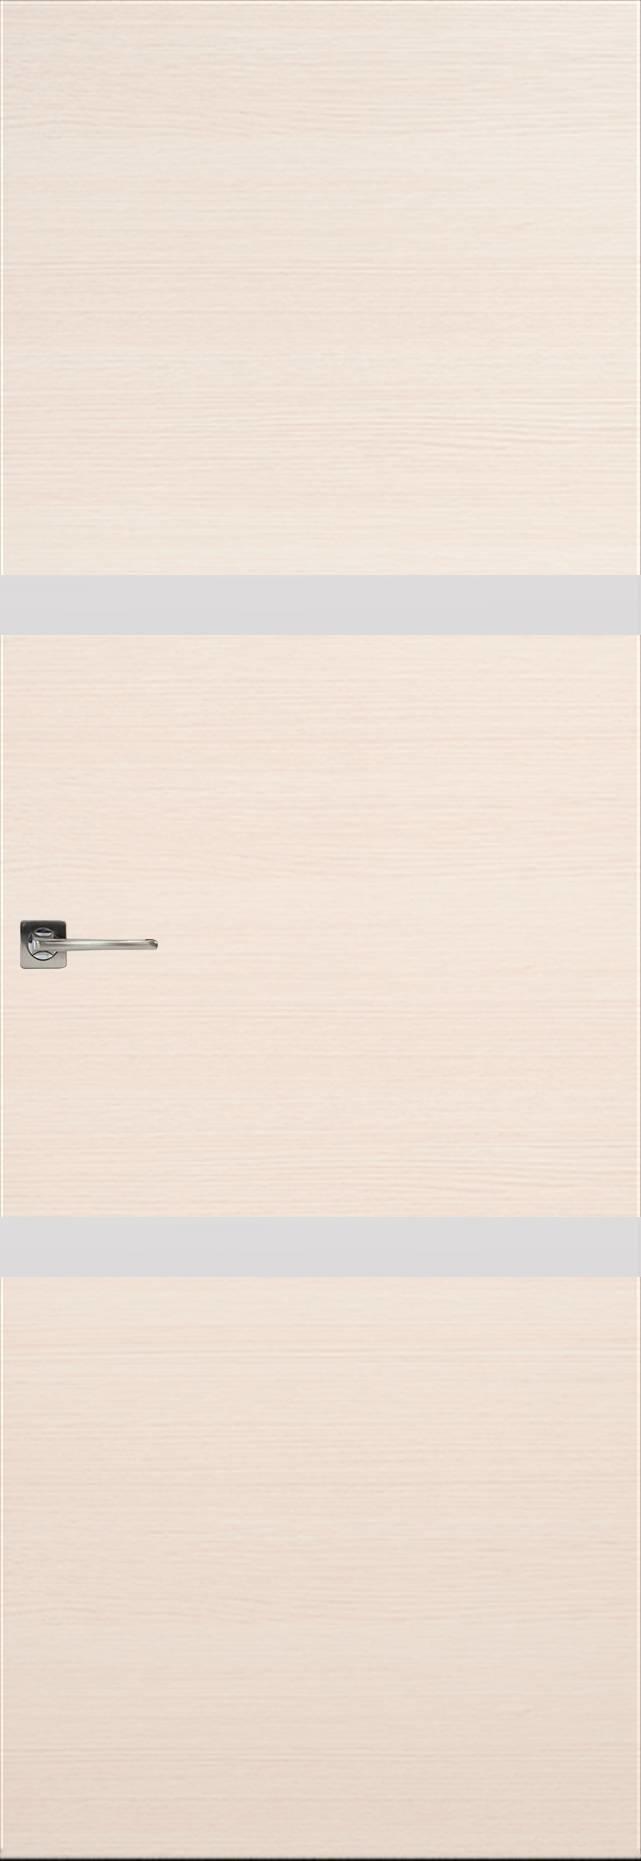 Tivoli В-4 Invisible цвет - Беленый дуб Без стекла (ДГ)